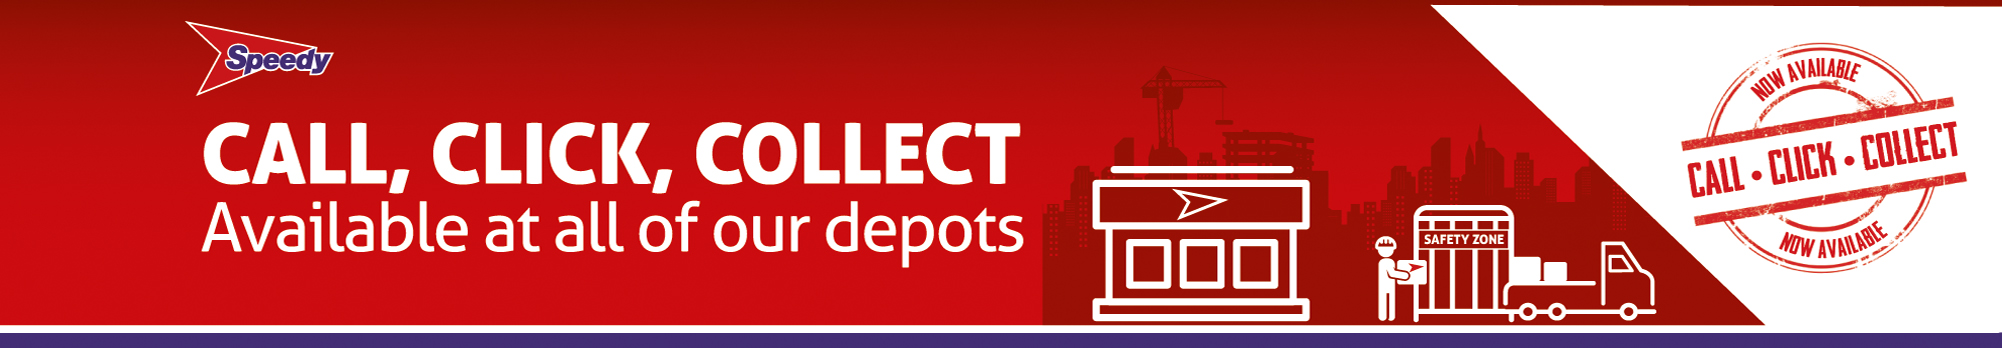 Call Click Collect Landing page header_Jan 2021.jpg